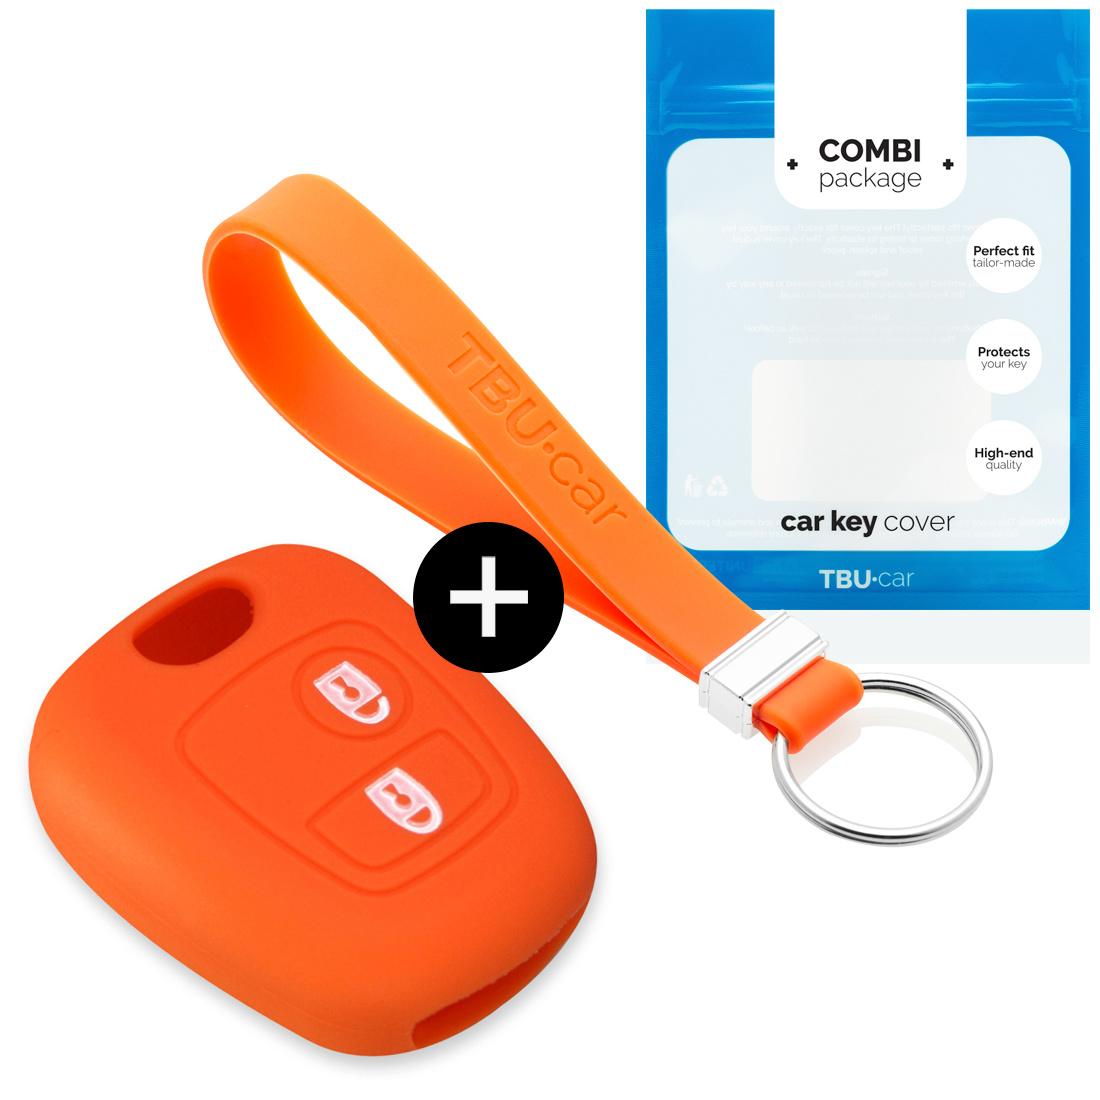 TBU car TBU car Autoschlüssel Hülle kompatibel mit Toyota 2 Tasten - Schutzhülle aus Silikon - Auto Schlüsselhülle Cover in Orange